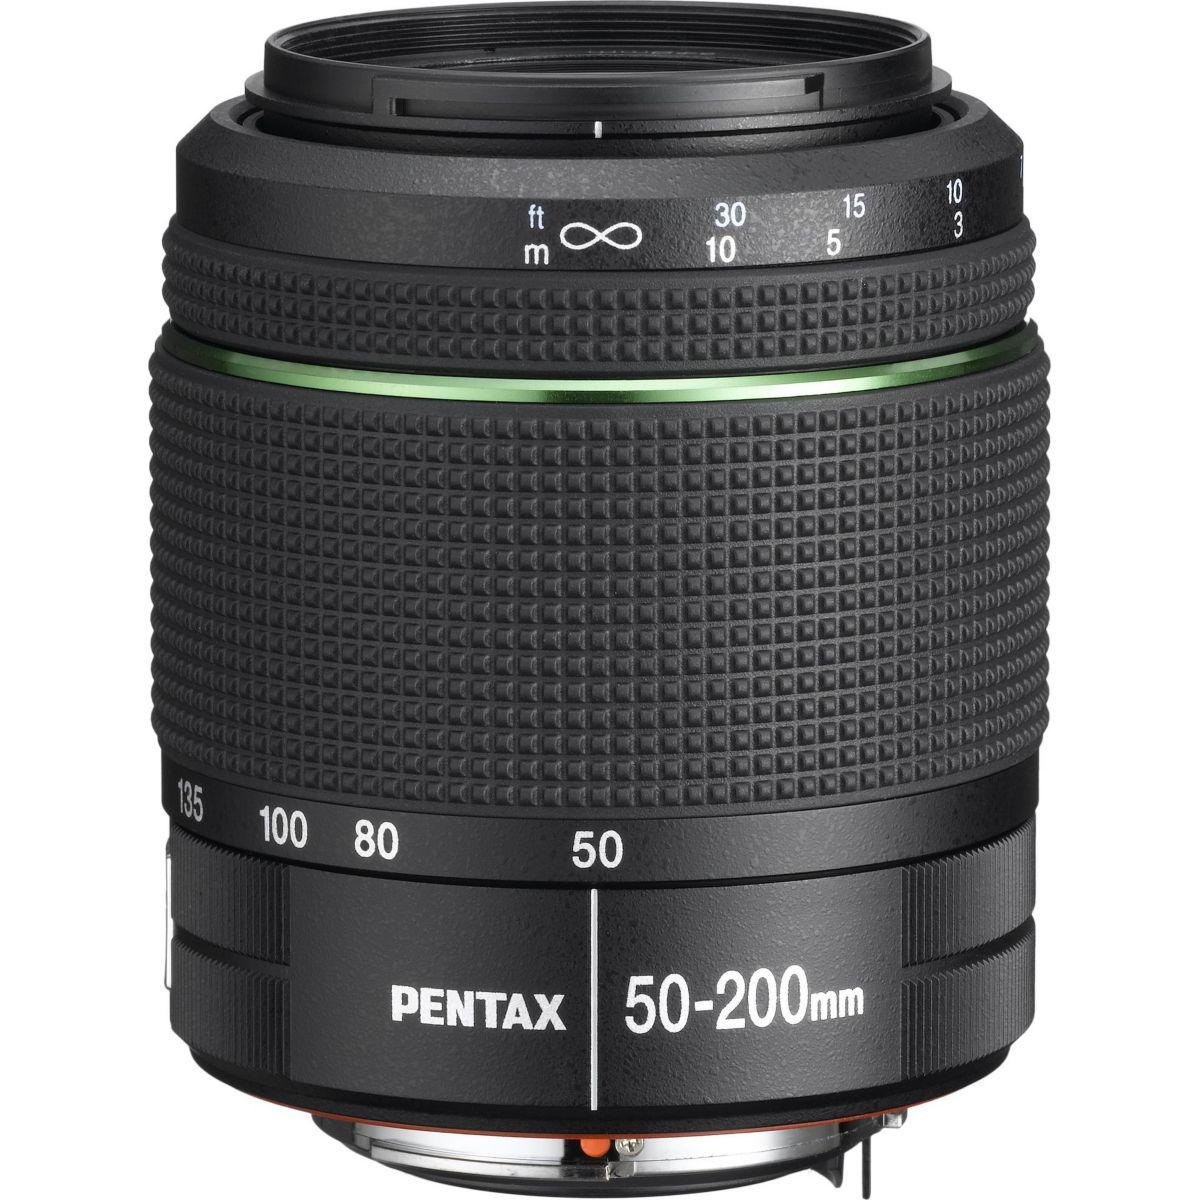 Objectif PENTAX 50-200mm f/4-5.6 AL WR